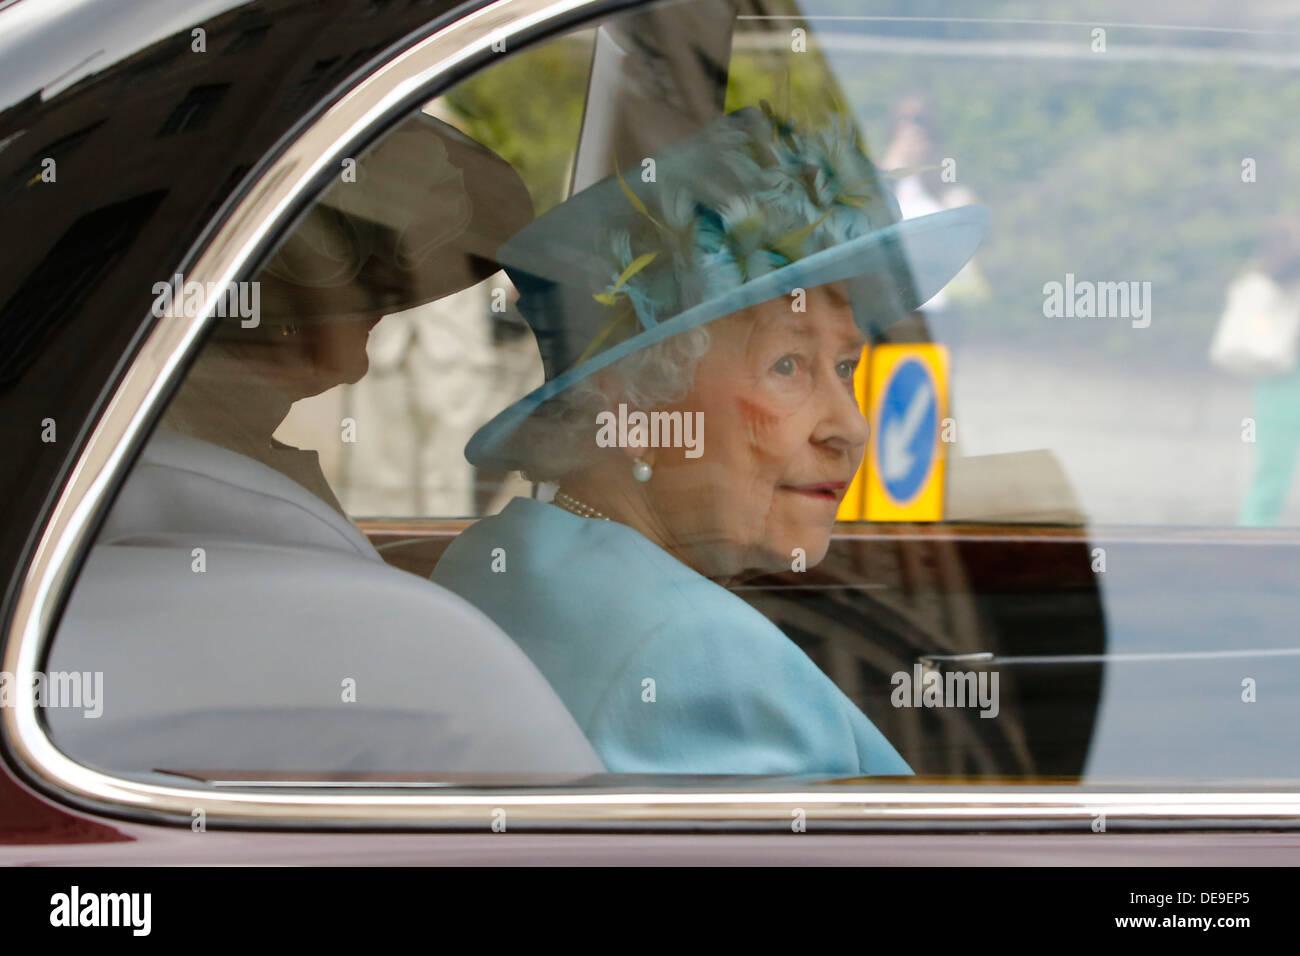 Britain's Queen Elizabeth II departs the new BBC Broadcasting House in London, Britain, 07 June 2013. - Stock Image